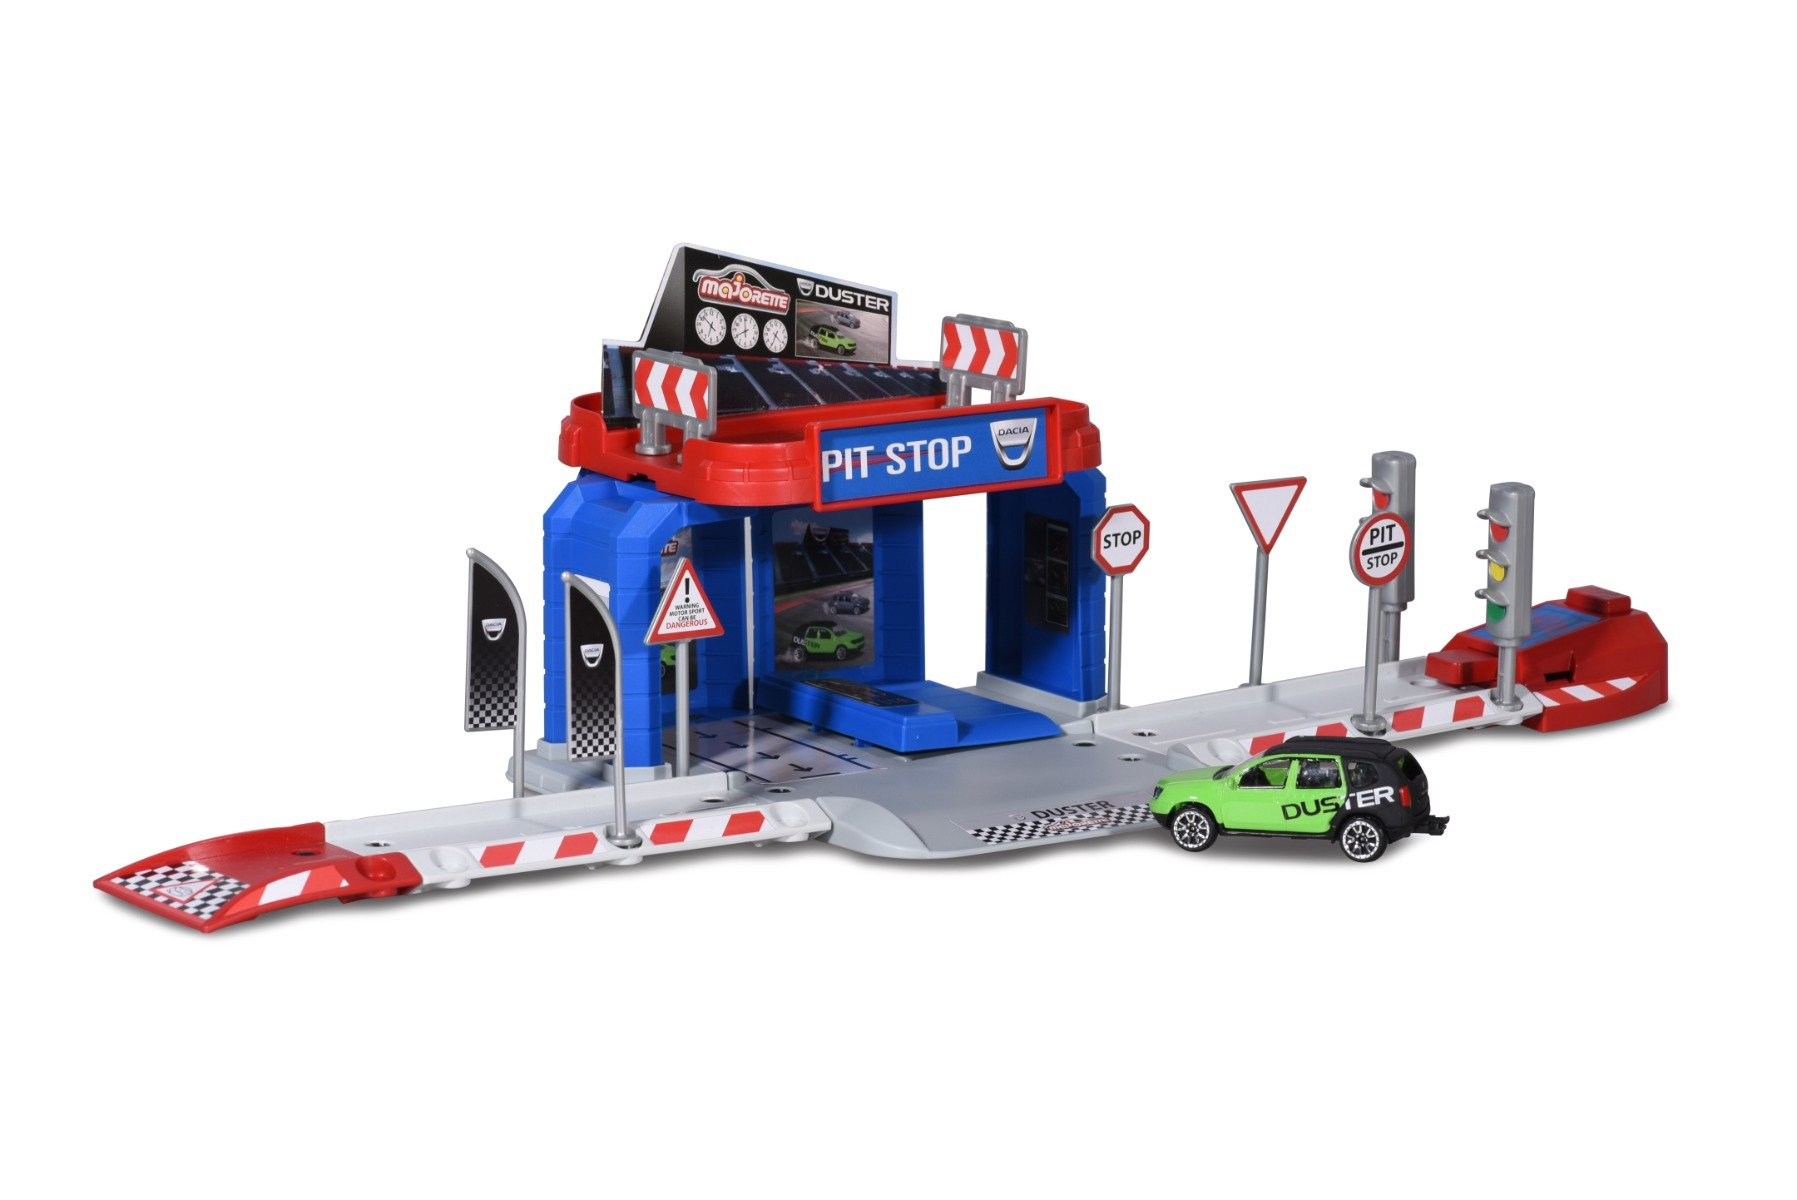 Set Garaj cu masinuta Majorette Vision Gran Turismo Pit Stop, Dacia Duster